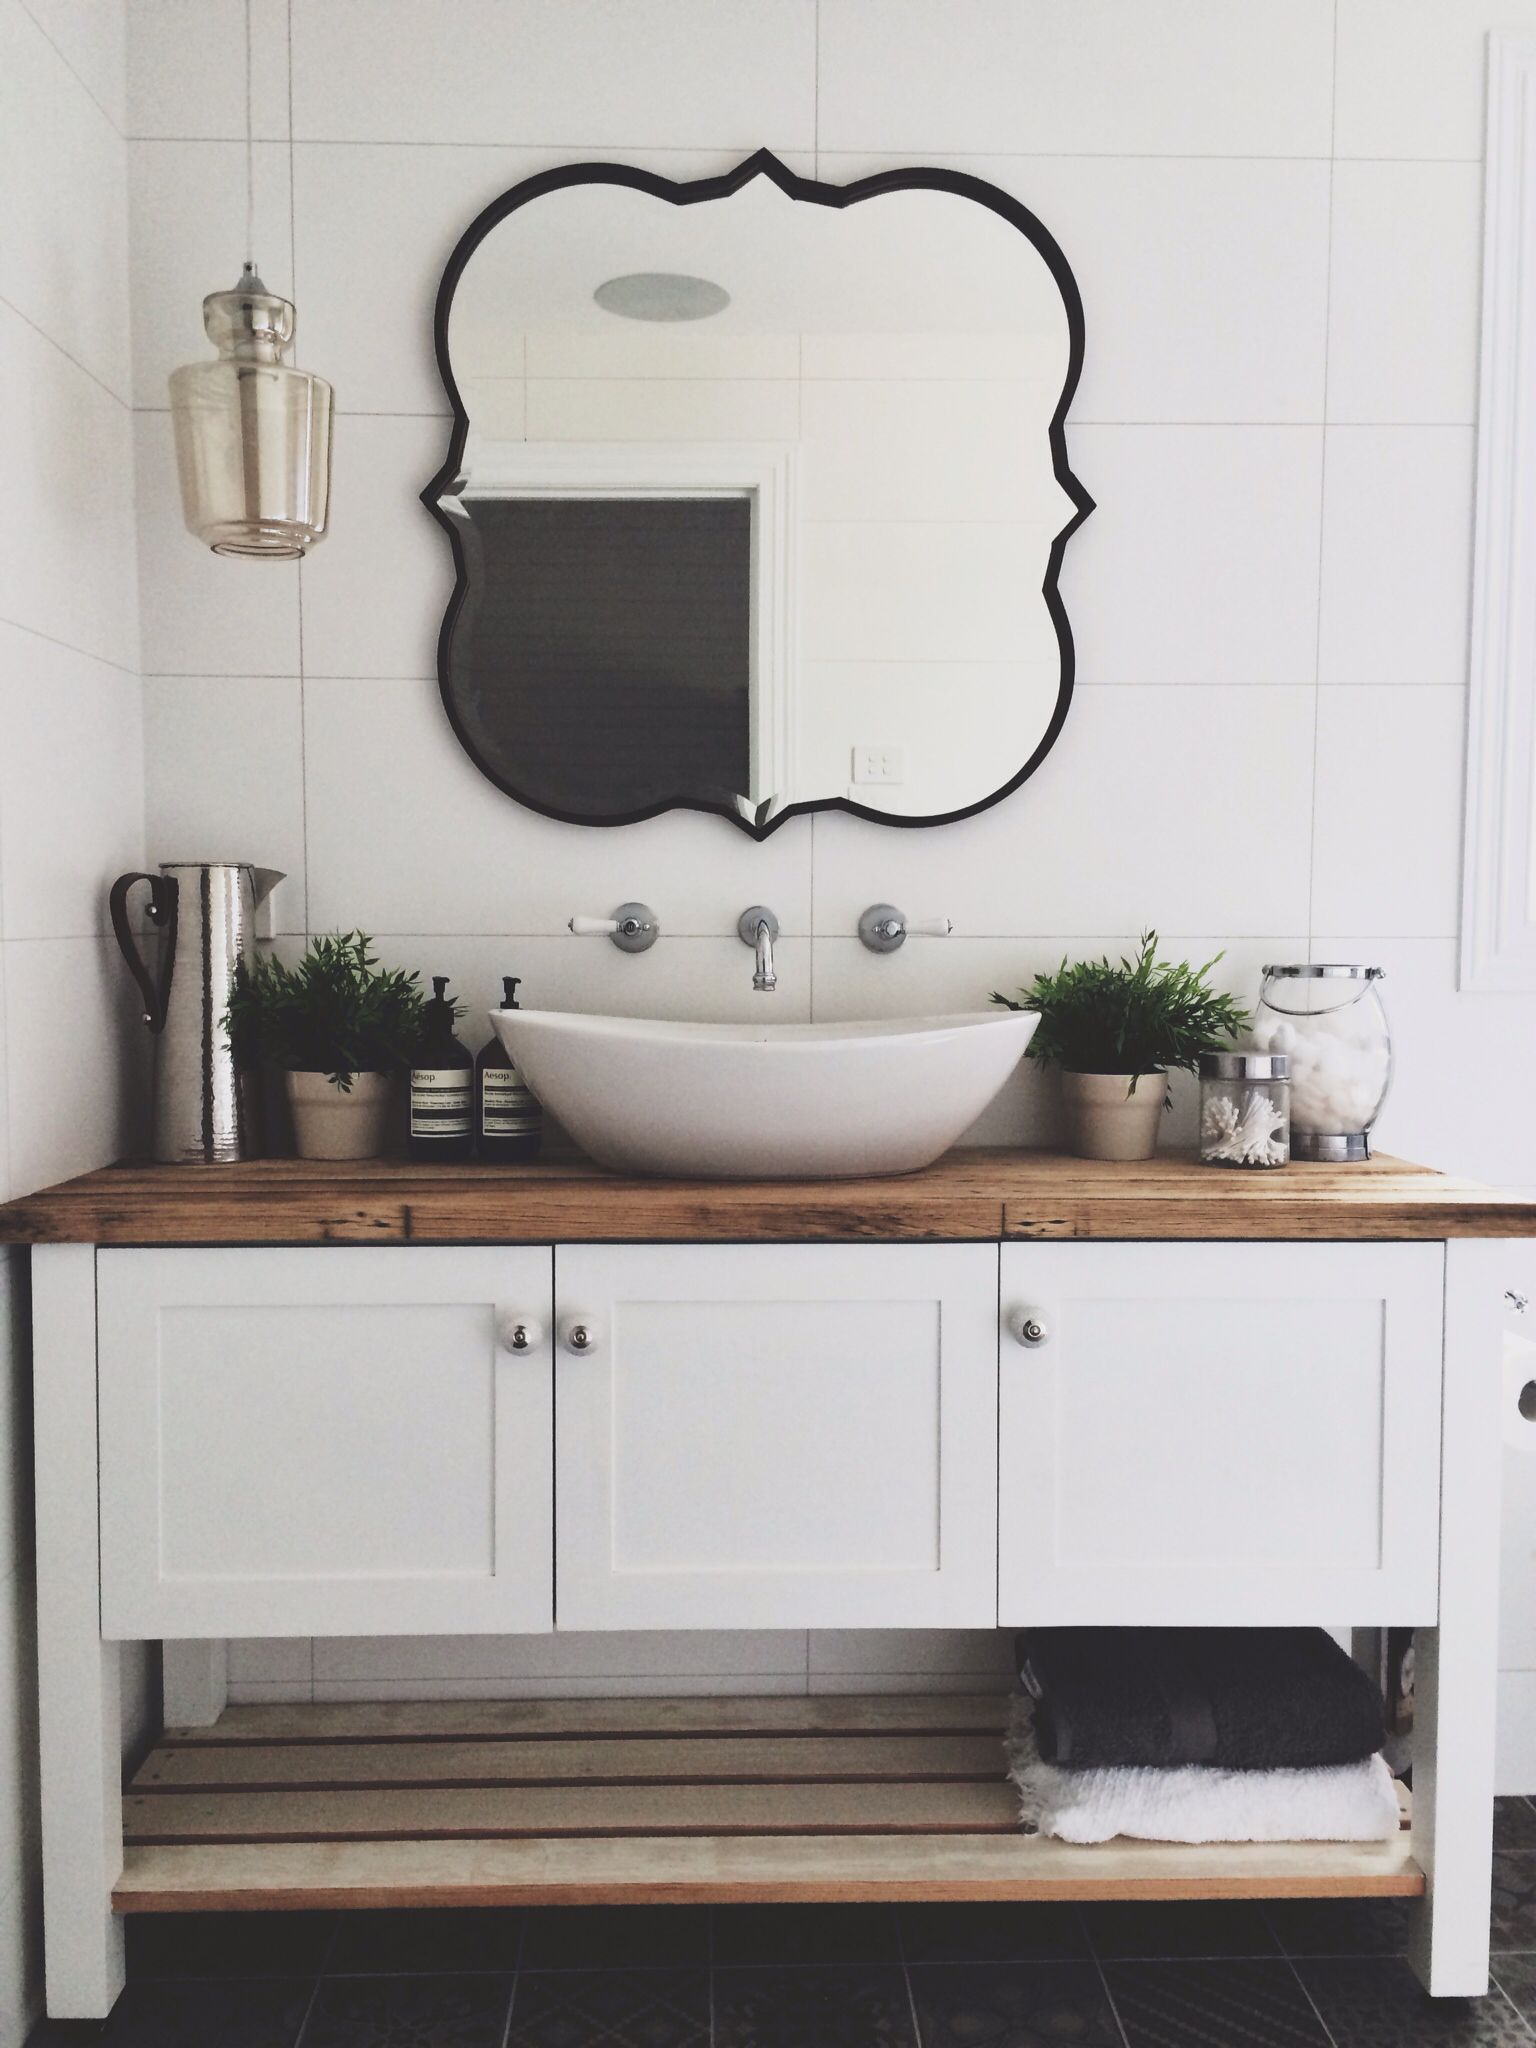 Modern Country Style Bathroom Ensuite Freestanding Vanity Basin White Mirror Desi Farmhouse Bathroom Vanity Bathroom Vanities For Sale Modern Country Bathrooms